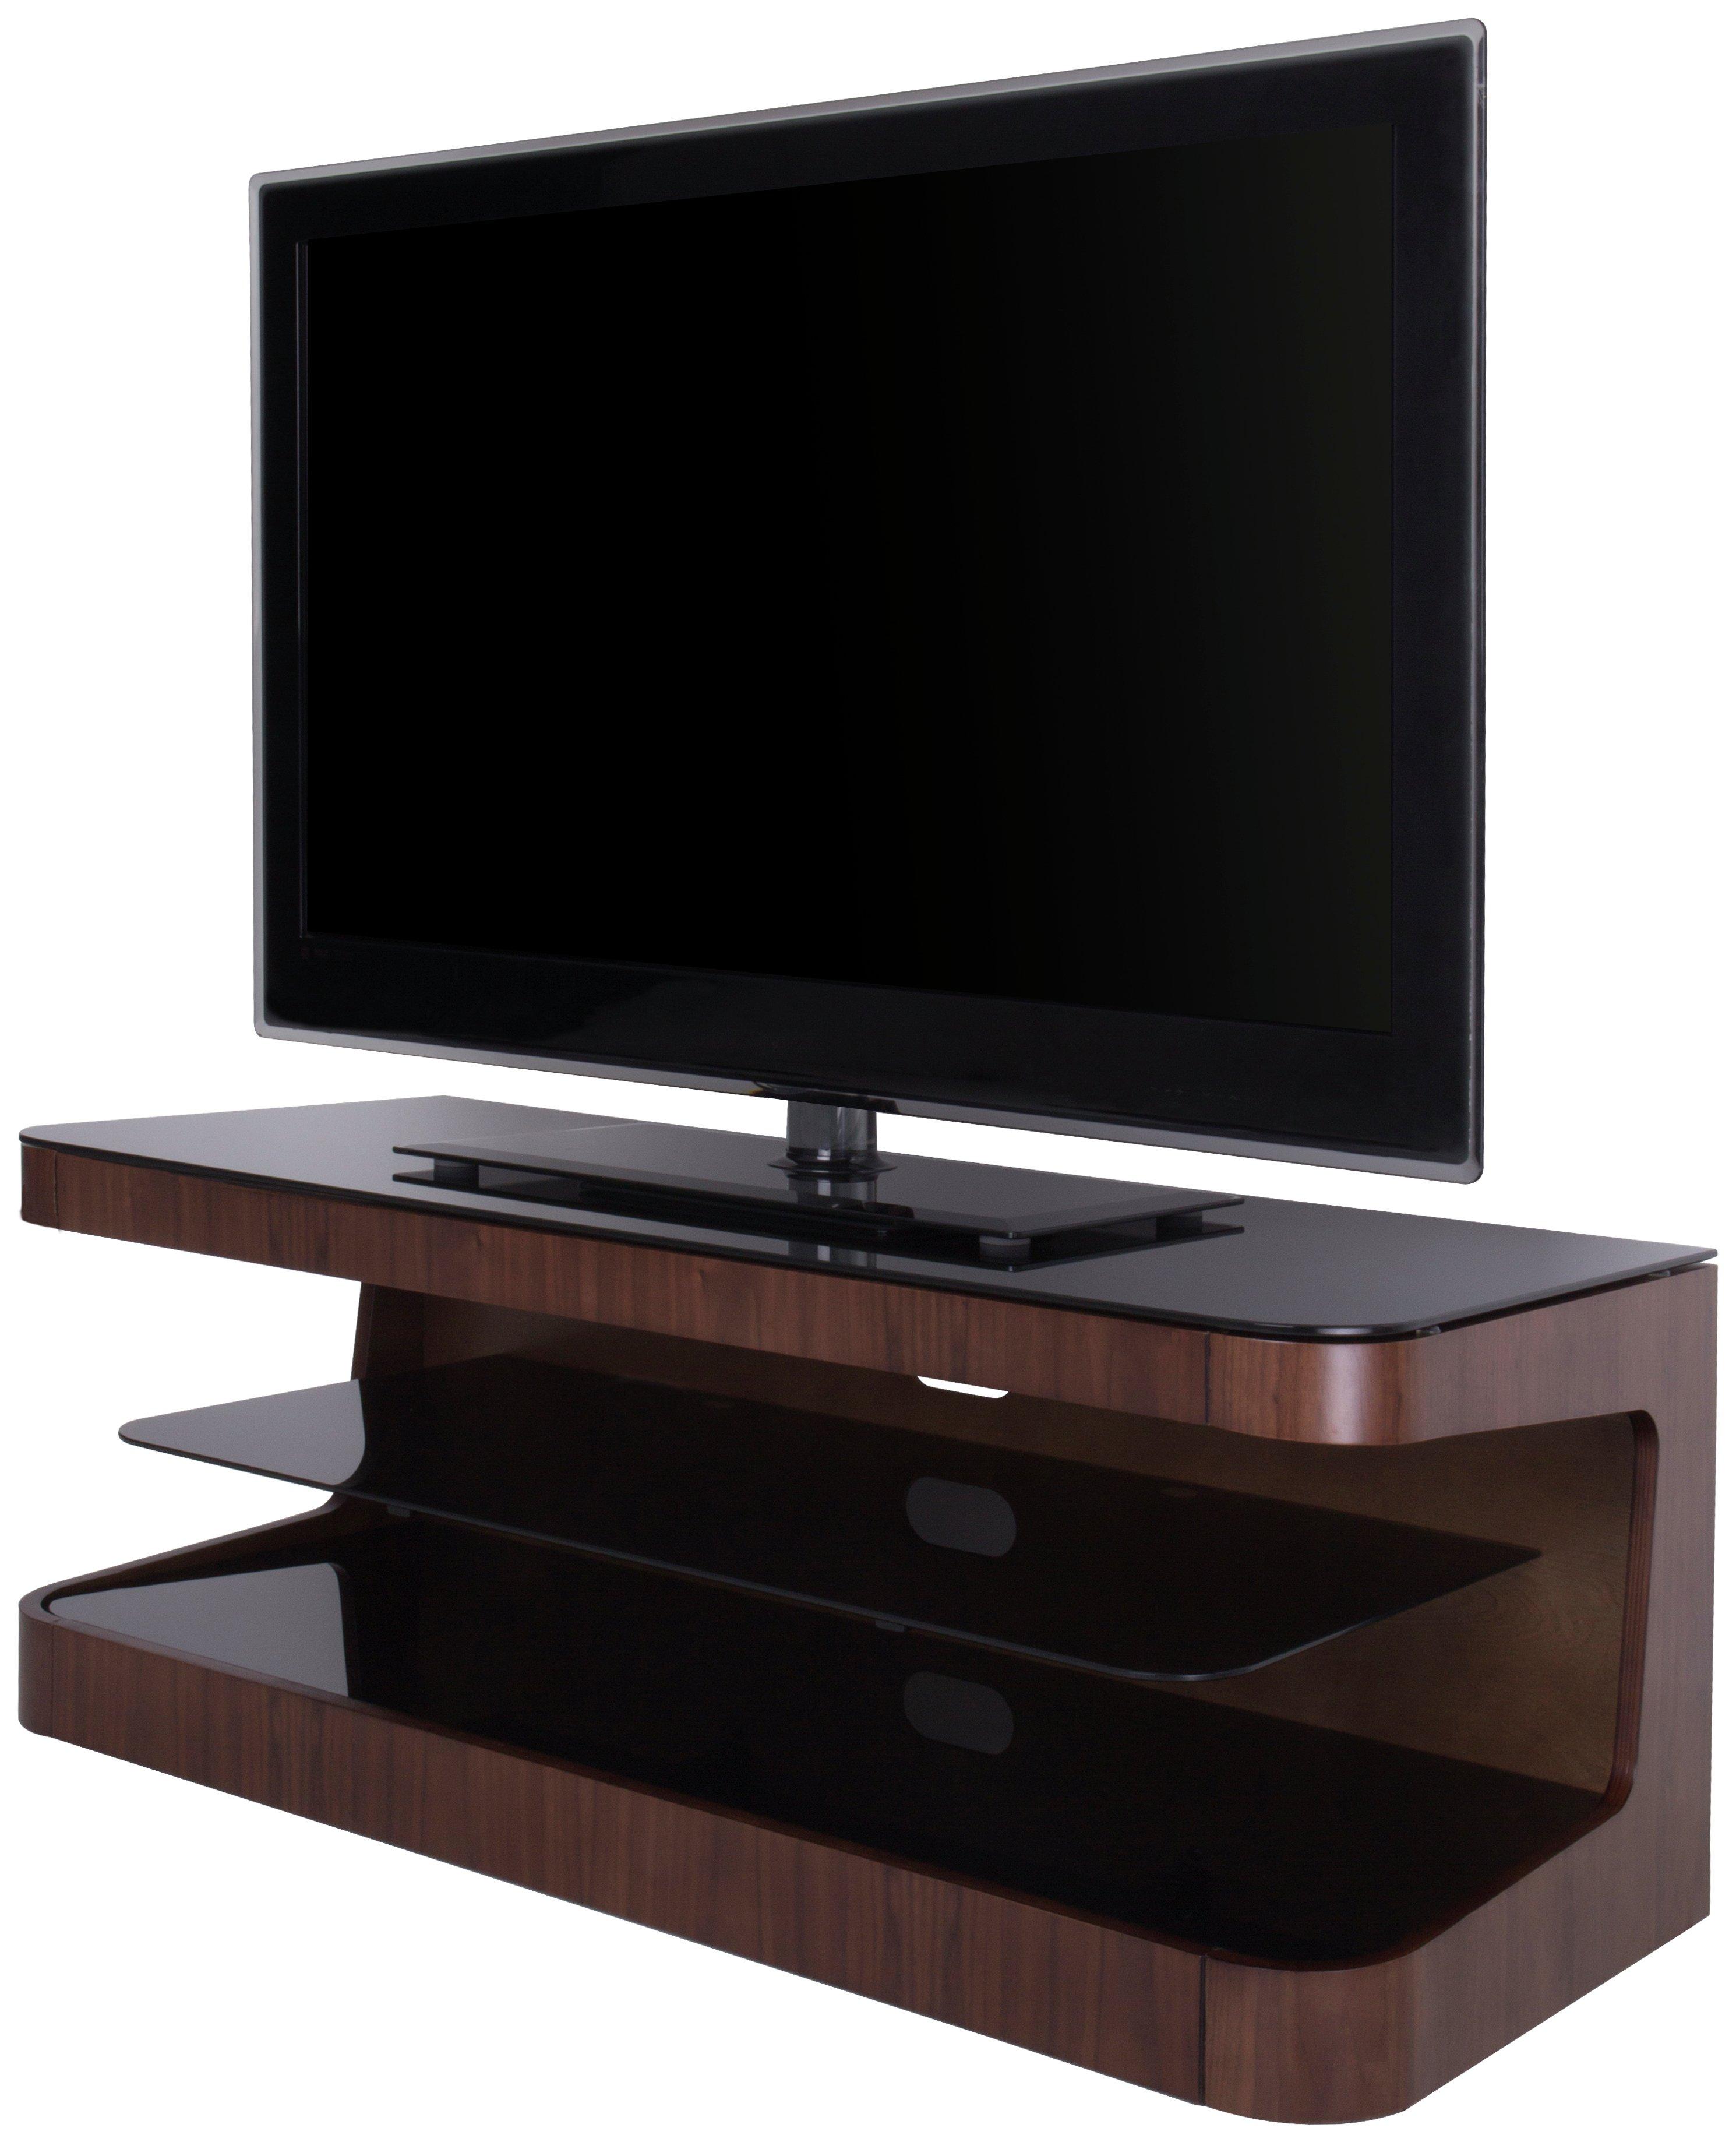 AVF Up to 55 Inch Wood TV Stand - Walnut